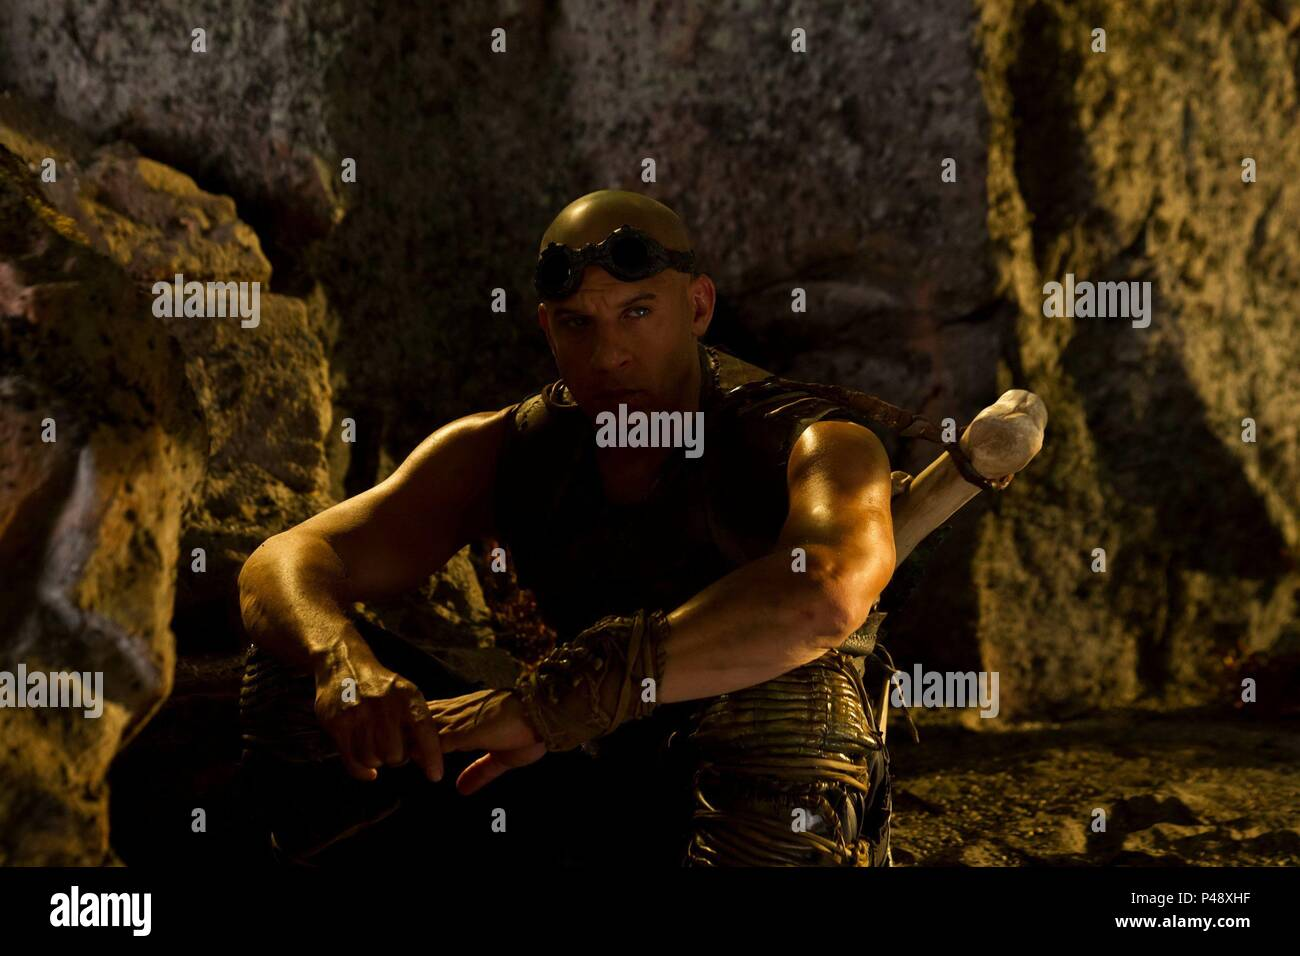 pictures Vin diesel to star in new videogame movie the wheelman